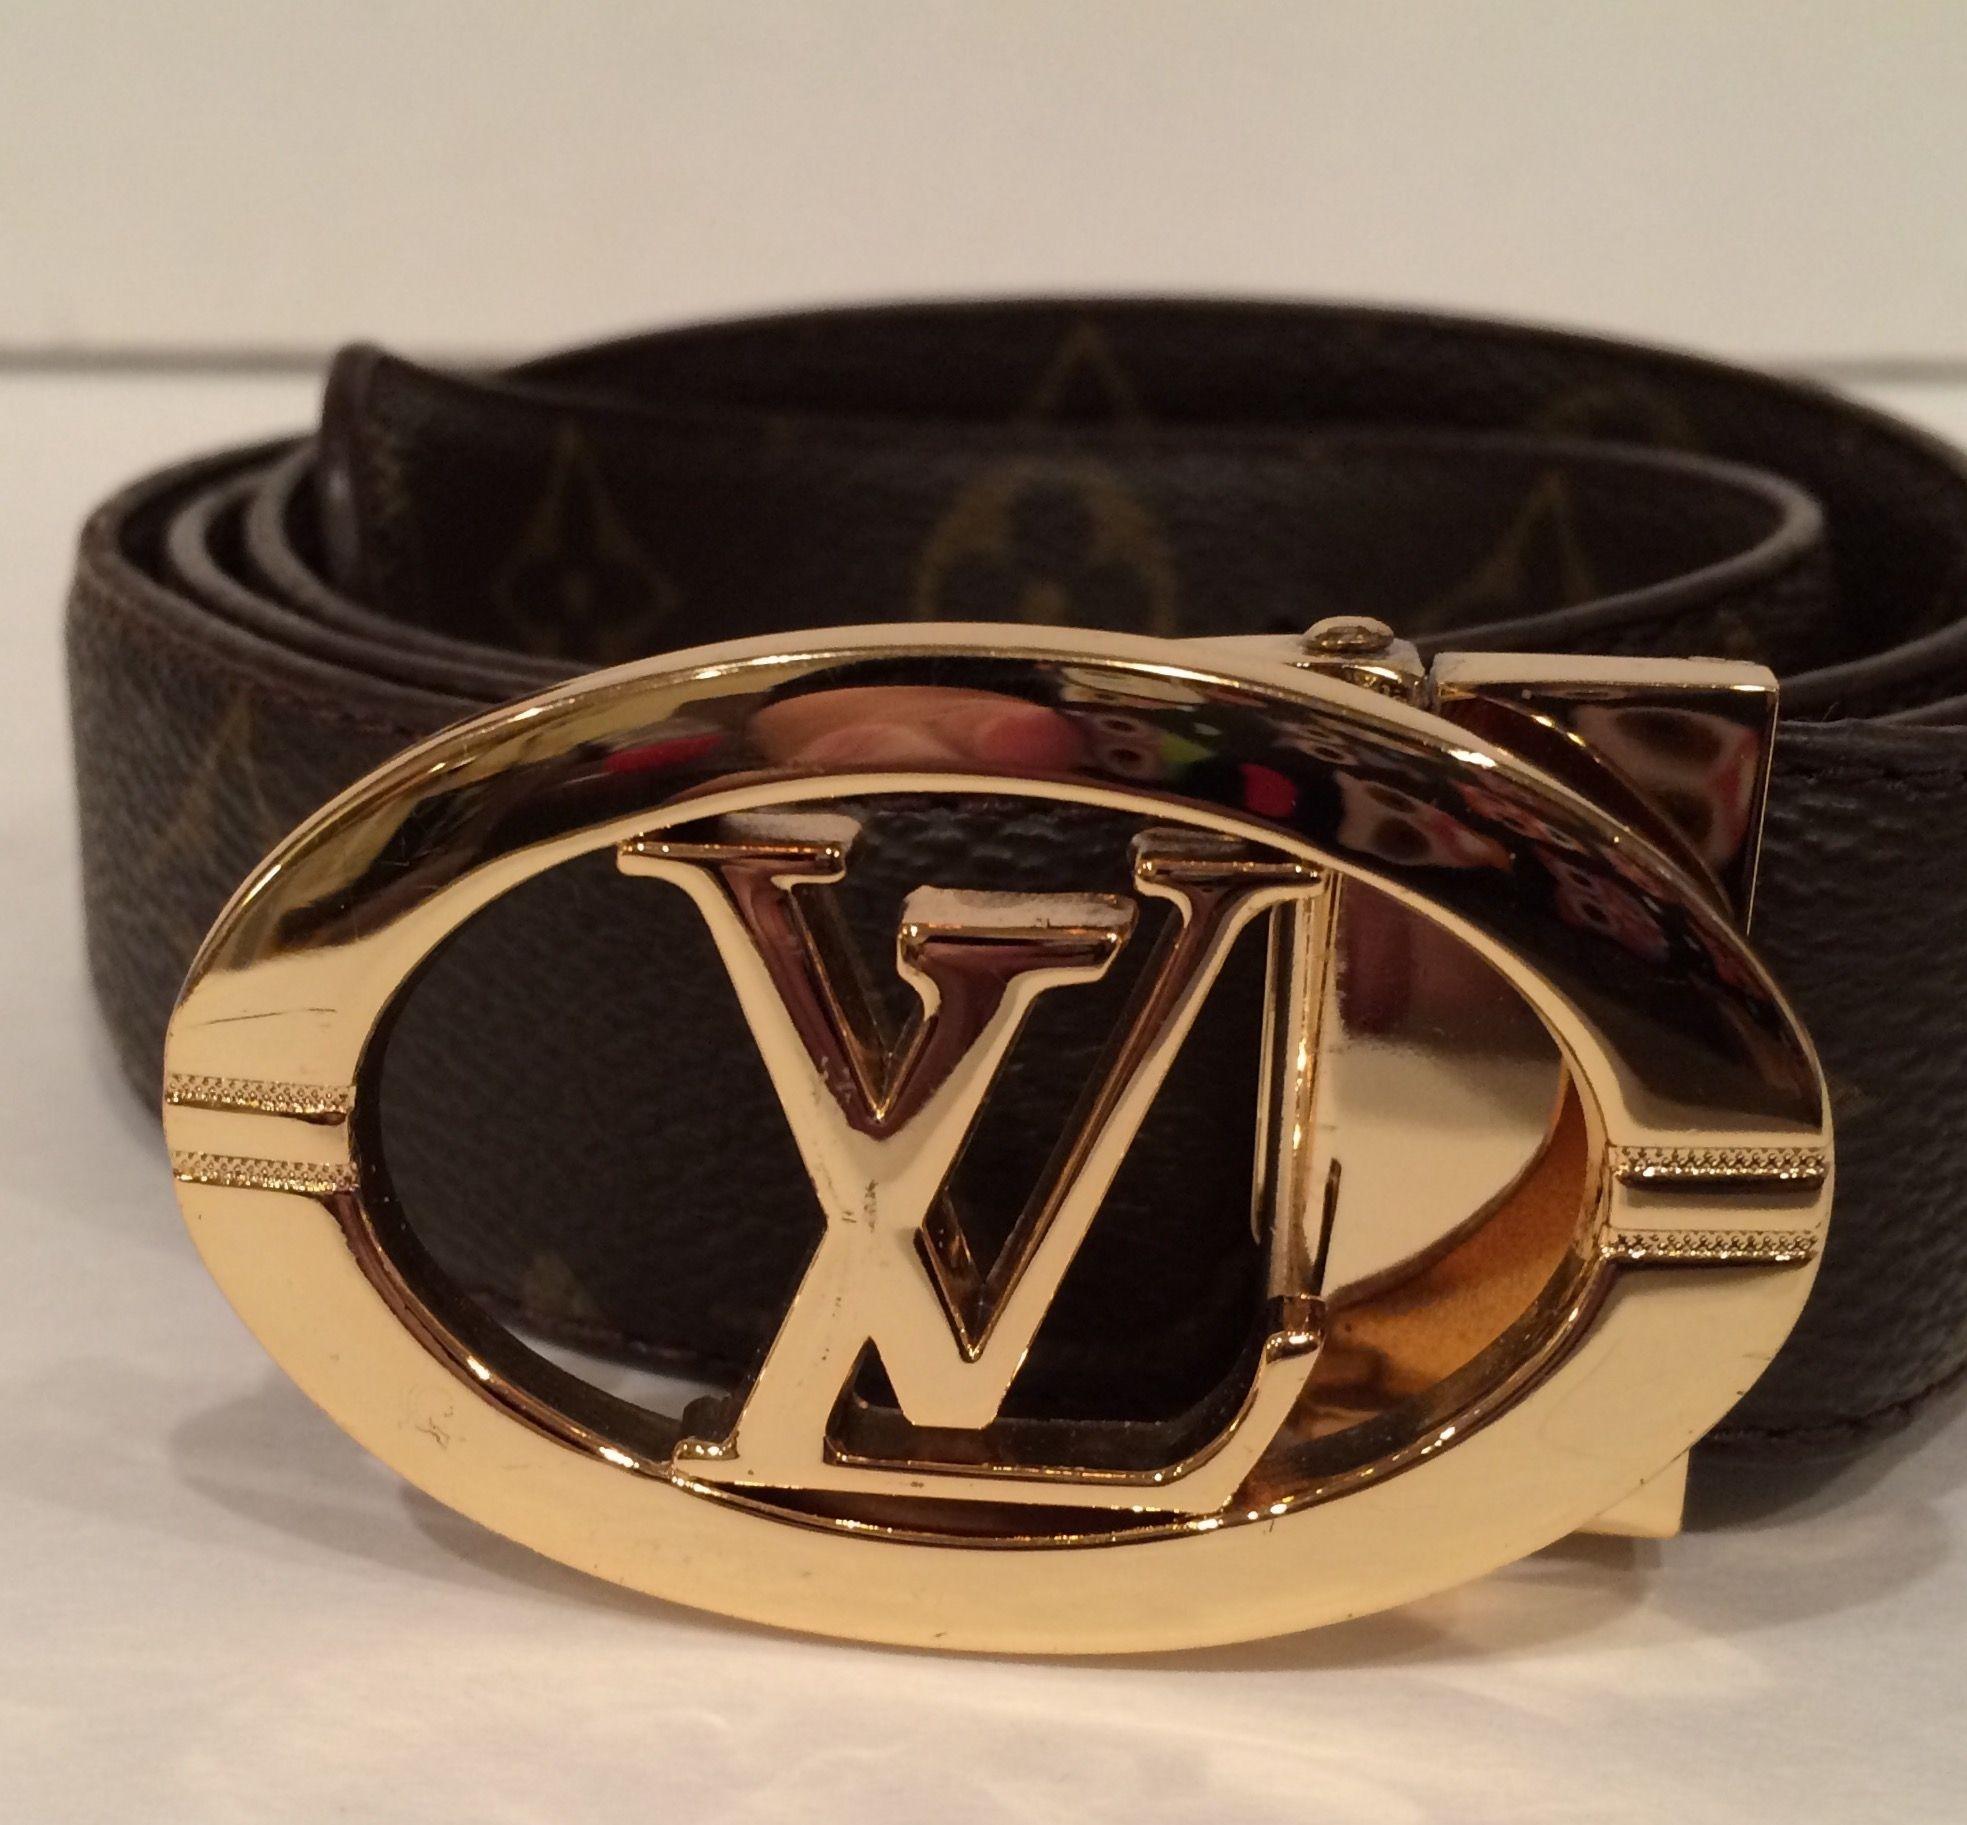 ba7b3f7f9ca6 Monogram LV Circle Belt. Get the lowest price on Monogram LV Circle Belt and  other fabulous designer clothing and accessories! Shop Tradesy now